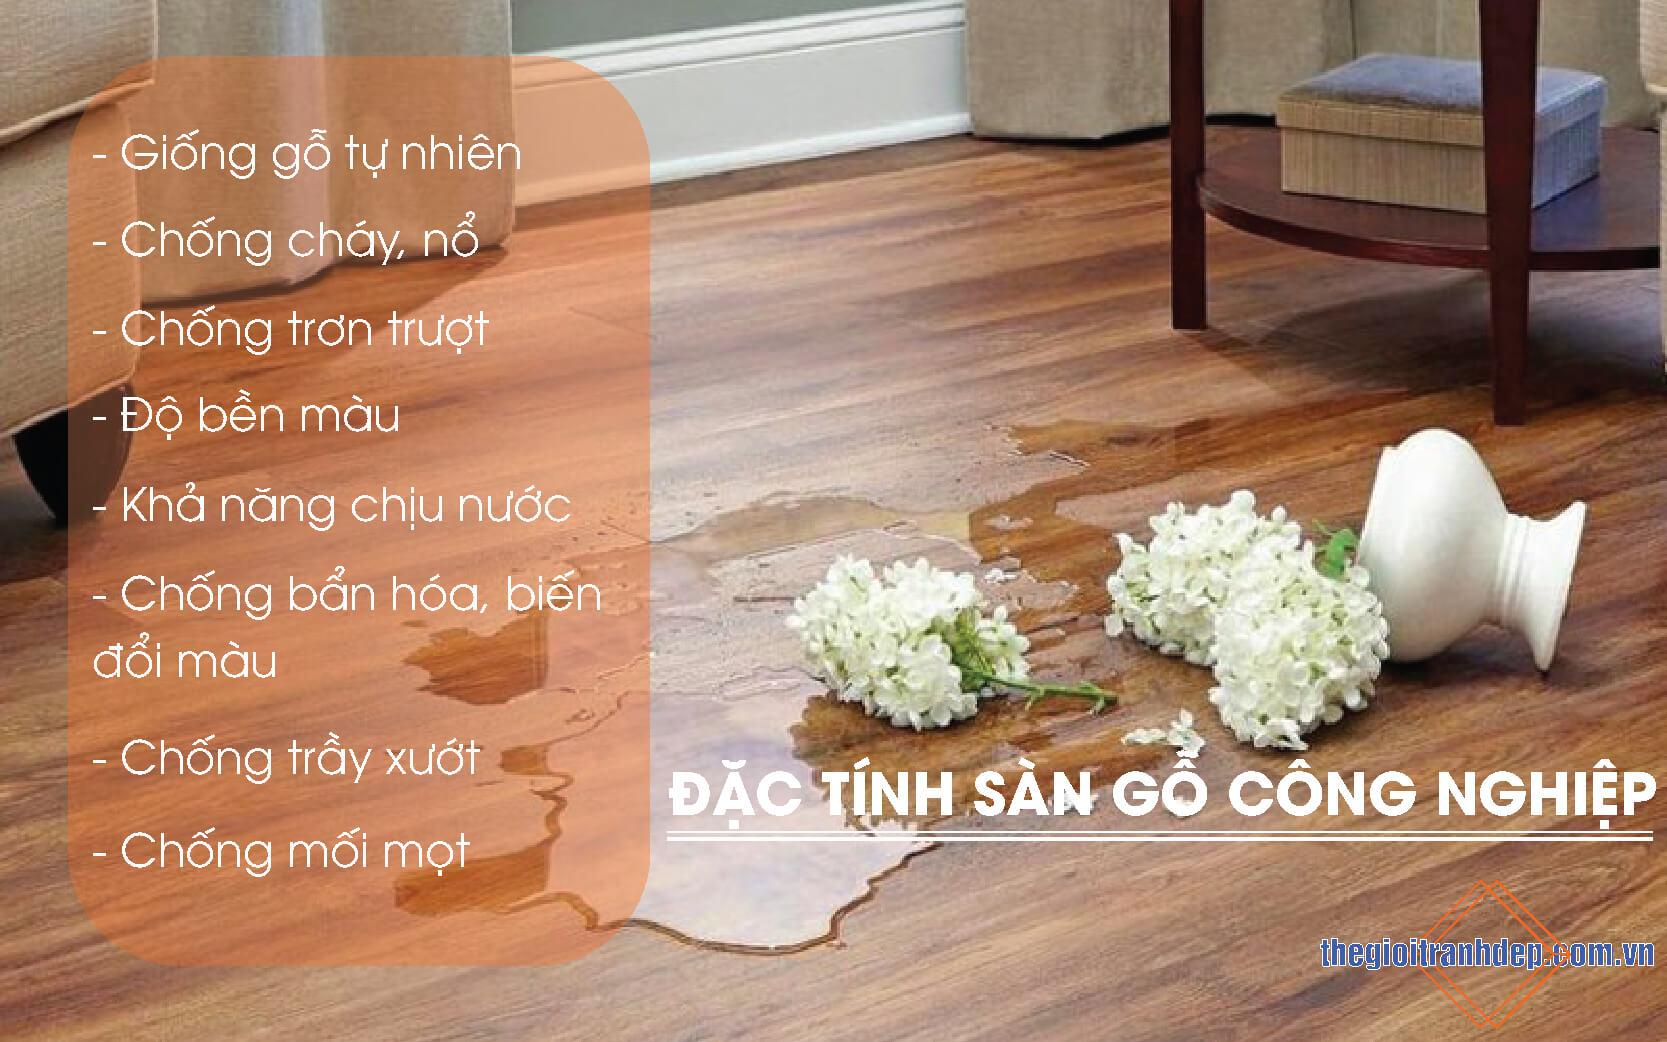 san-go-cong-nghiep-gia-re-16